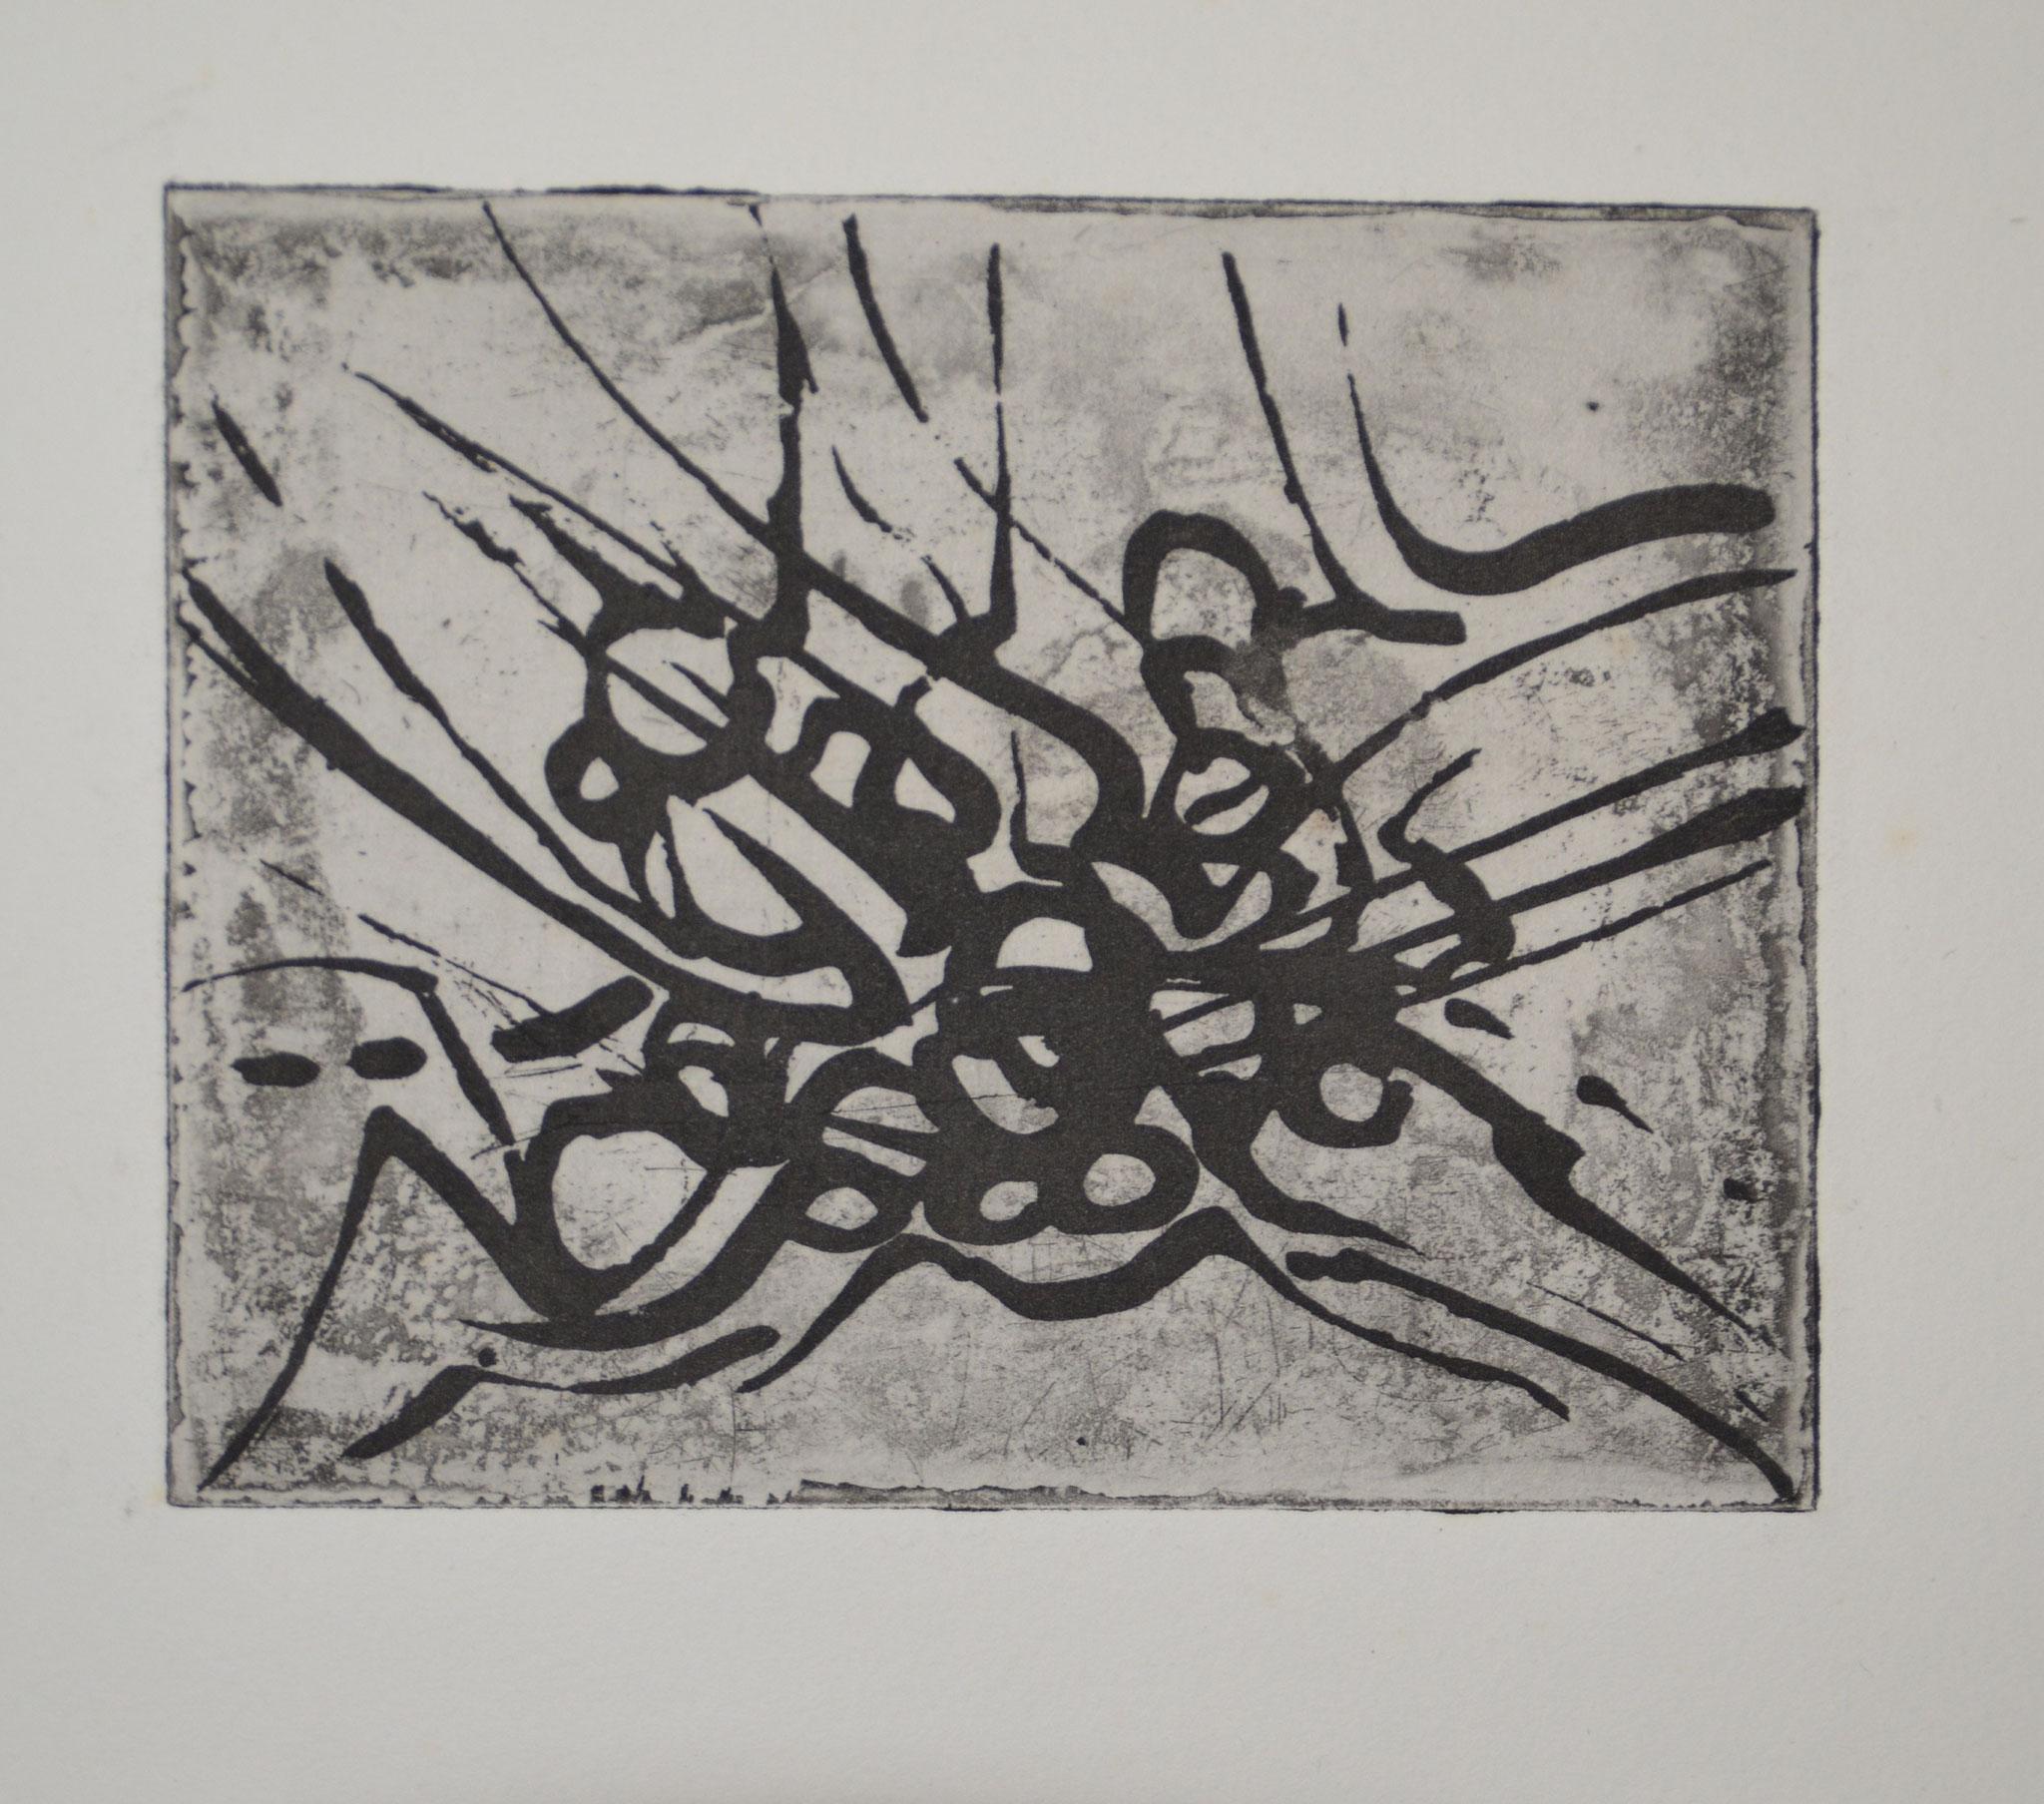 Lucta! gravure 33x25cm 1973